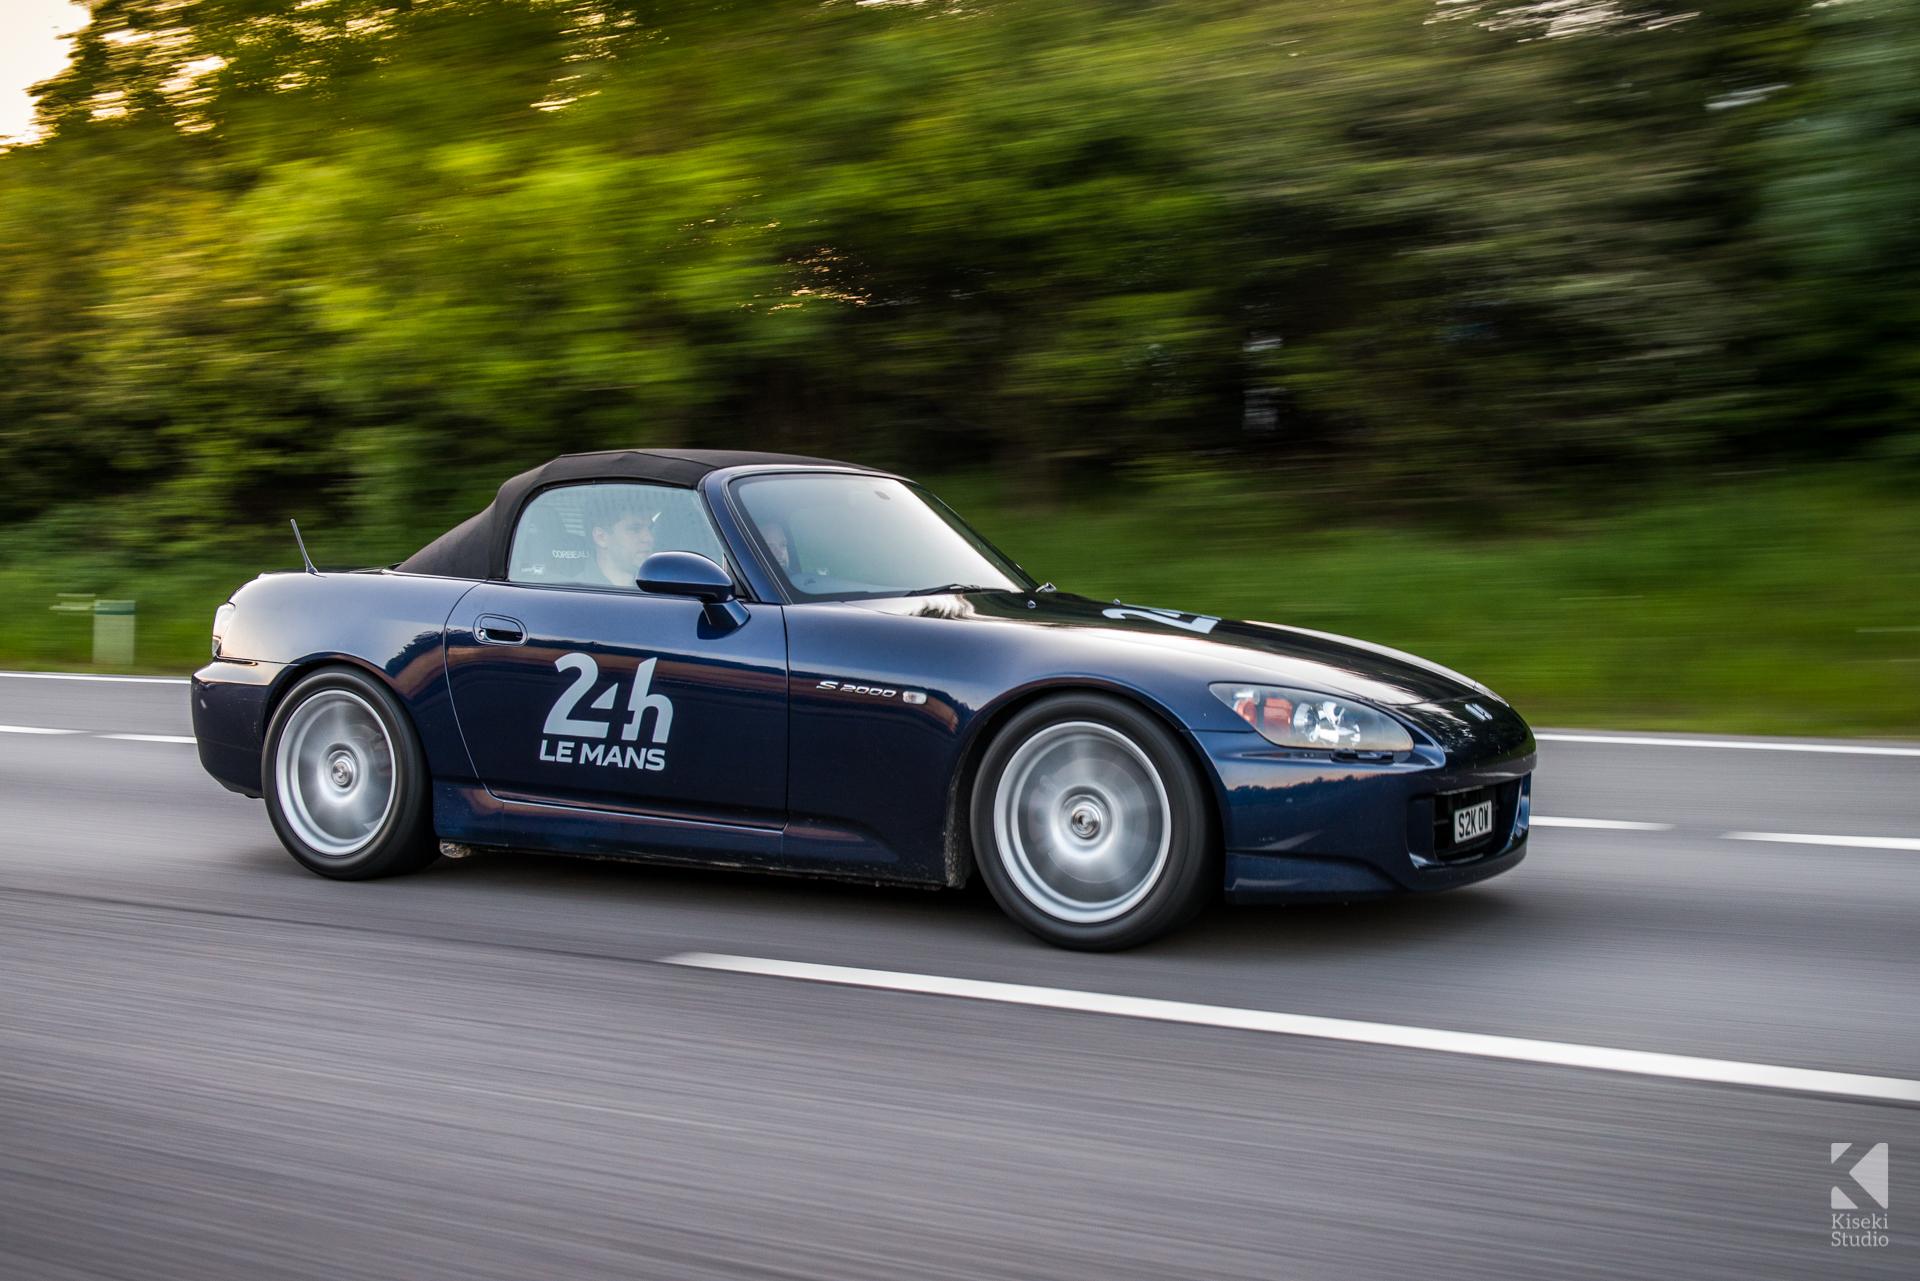 24 Hours Le Mans 2015 - S2000 Rolling